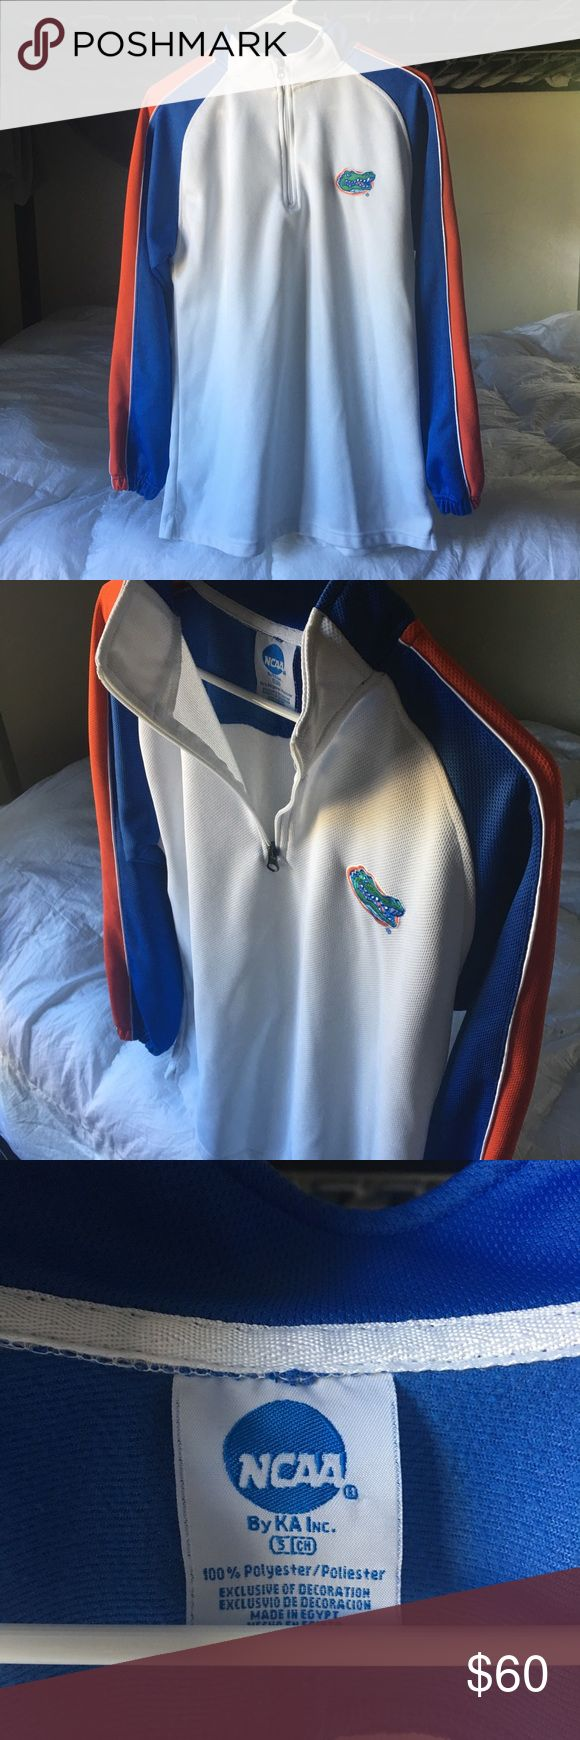 Quarter zip Florida Gator jacket Blue, orange, white quarter zip jacket. NCAA Jackets & Coats